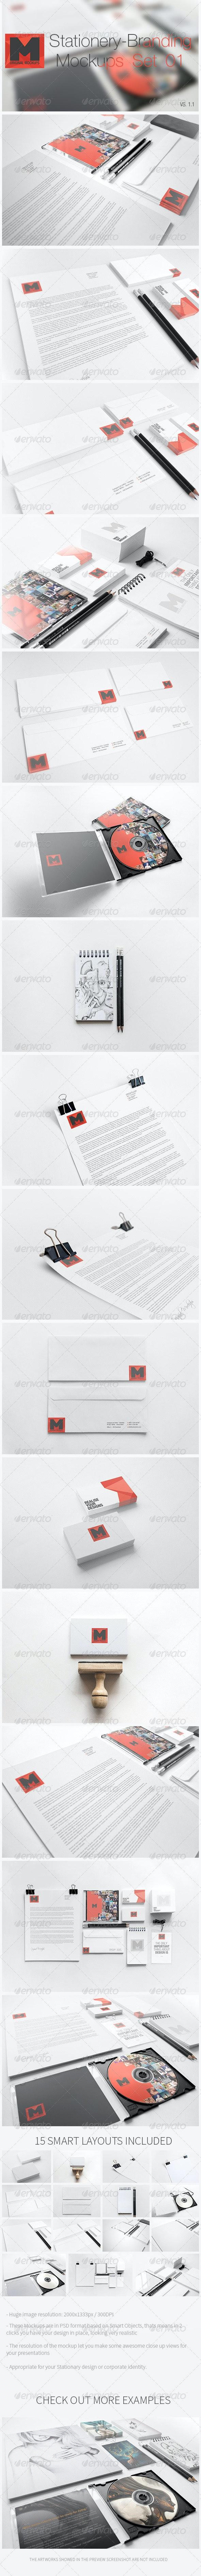 Stationery - Branding Mockups - Set 01 - Print Product Mock-Ups